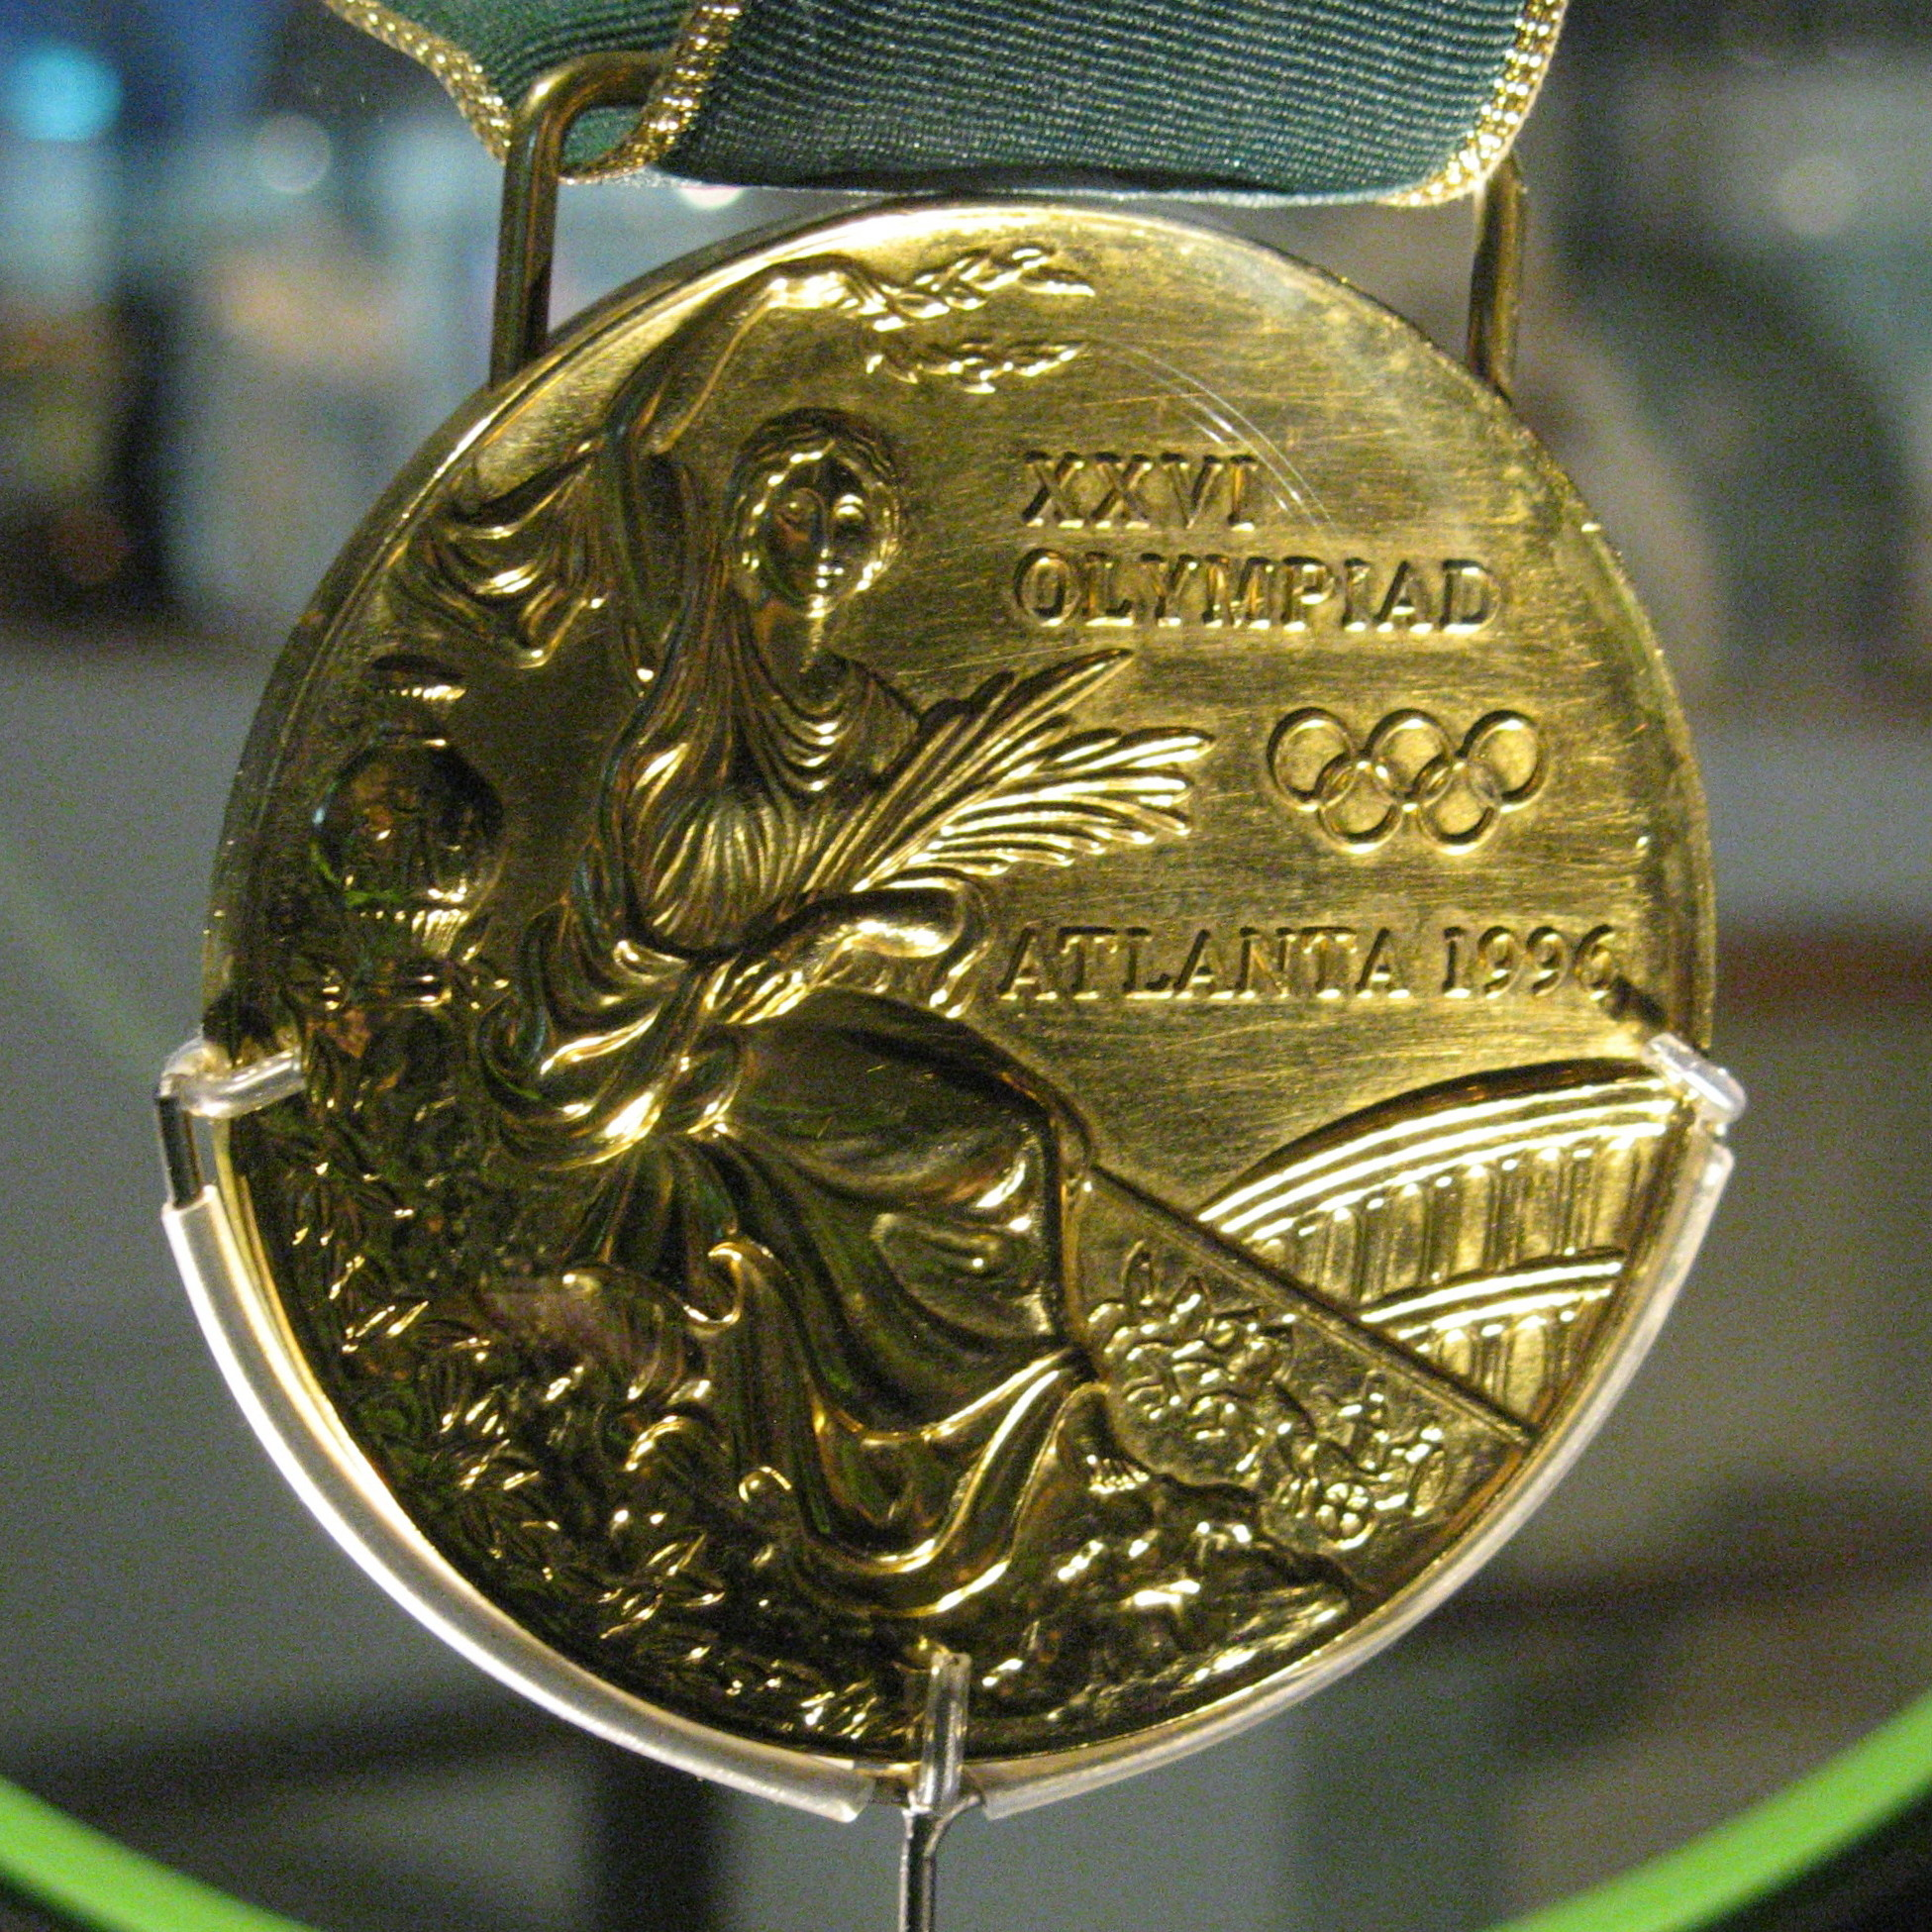 File:Olympic gold medal, Nova Peris, 1996, obverse.jpg ...